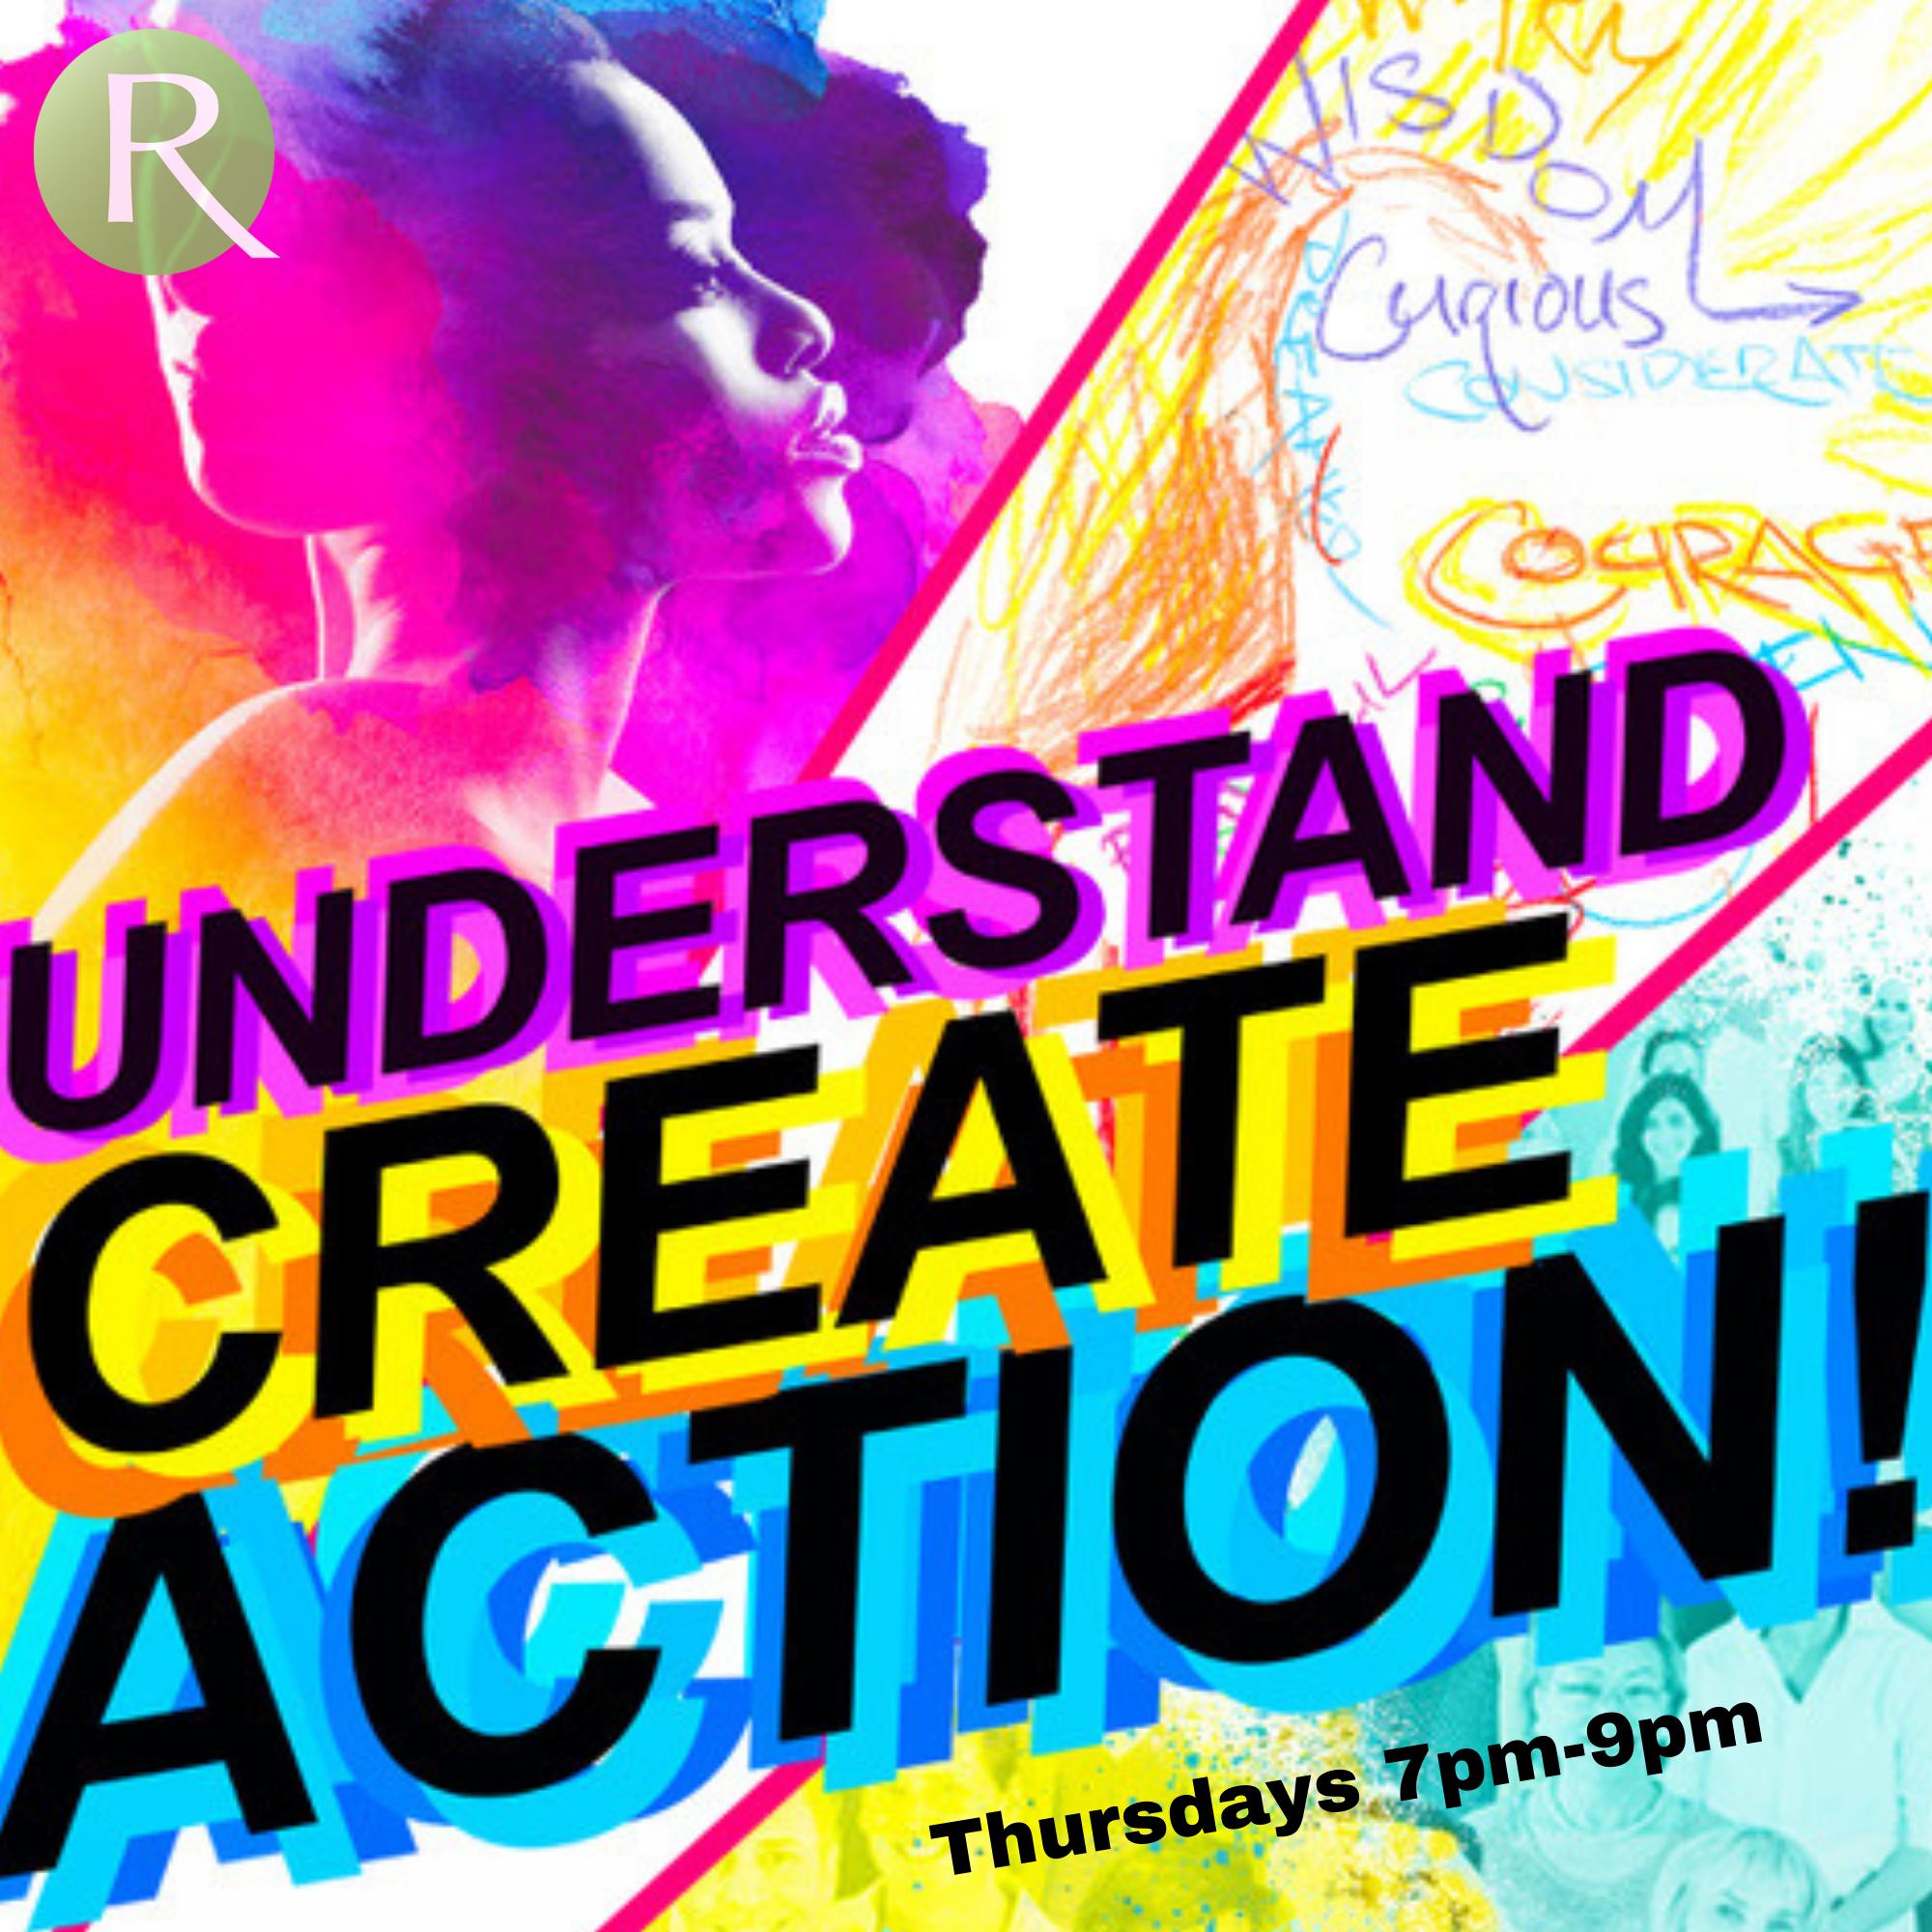 Understand - Create - Action!